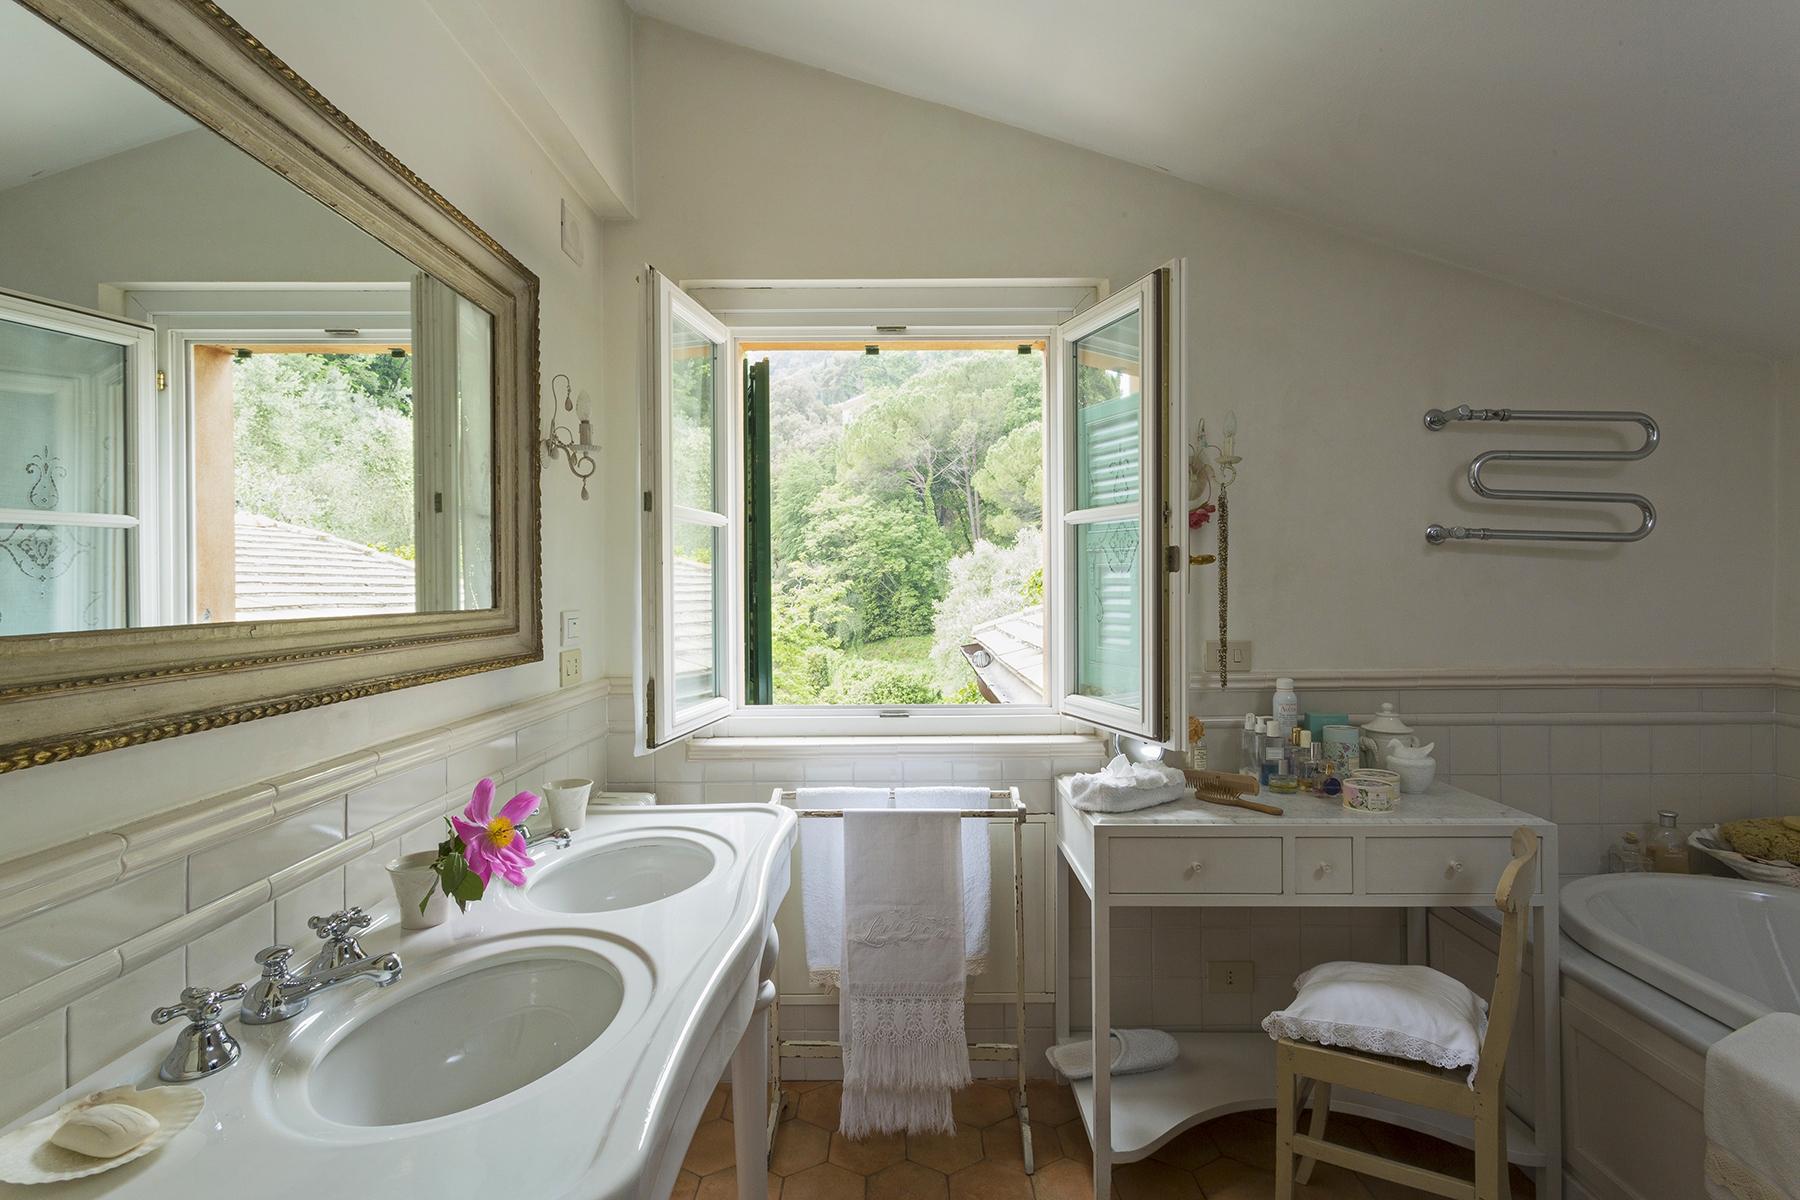 Villa in Vendita a Santa Margherita Ligure: 5 locali, 580 mq - Foto 24